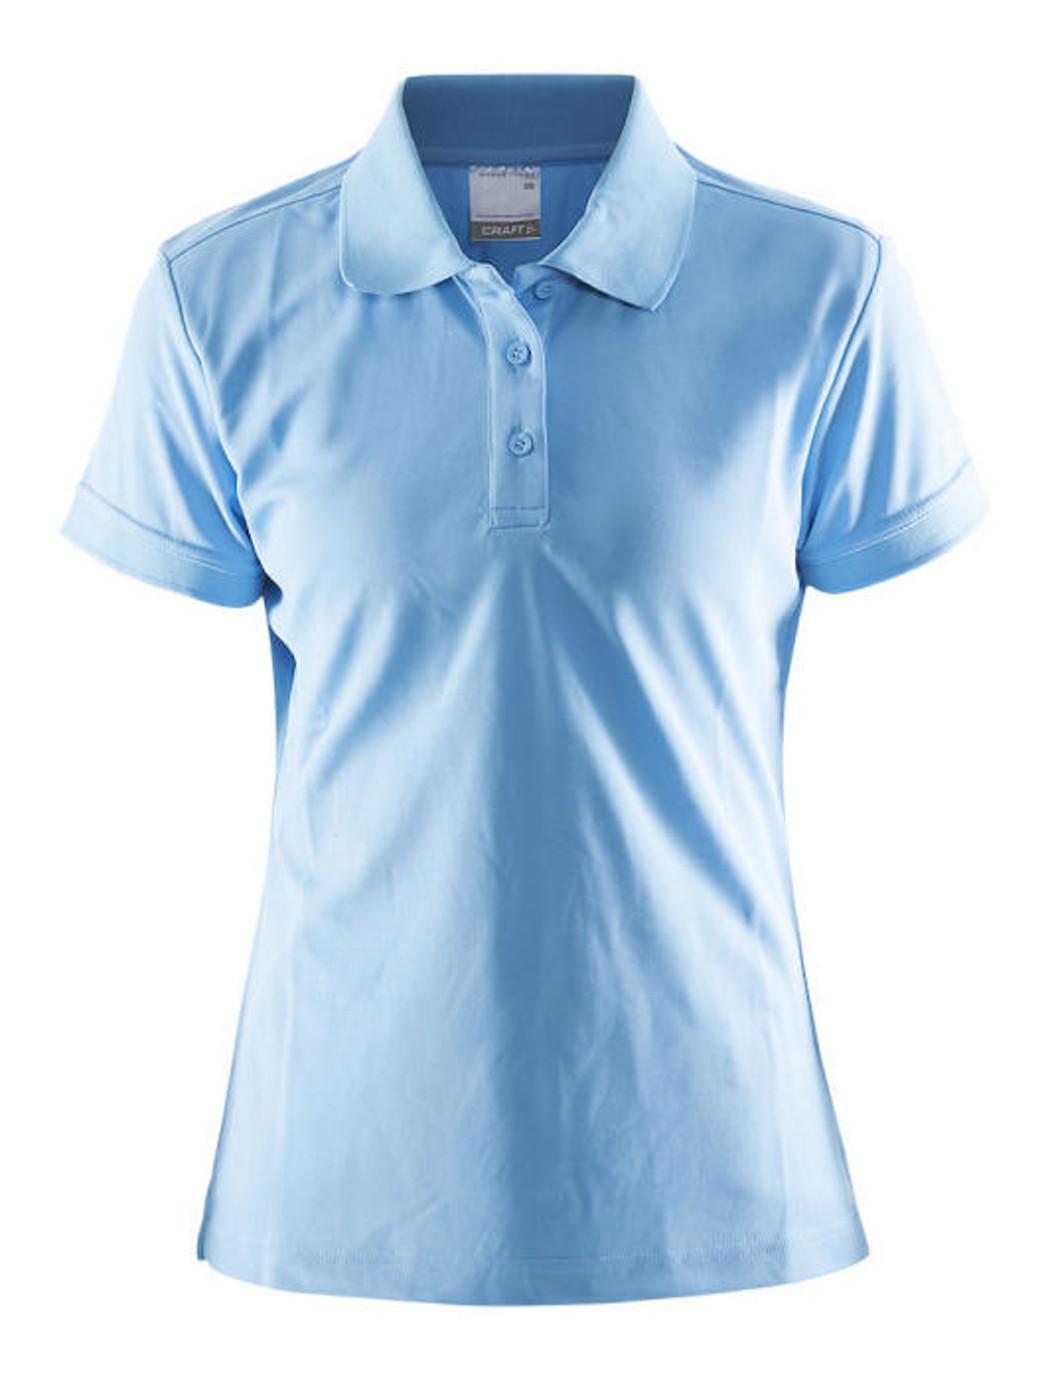 CRAFT Polo Shirt PIQUE CLASSIC - Damen